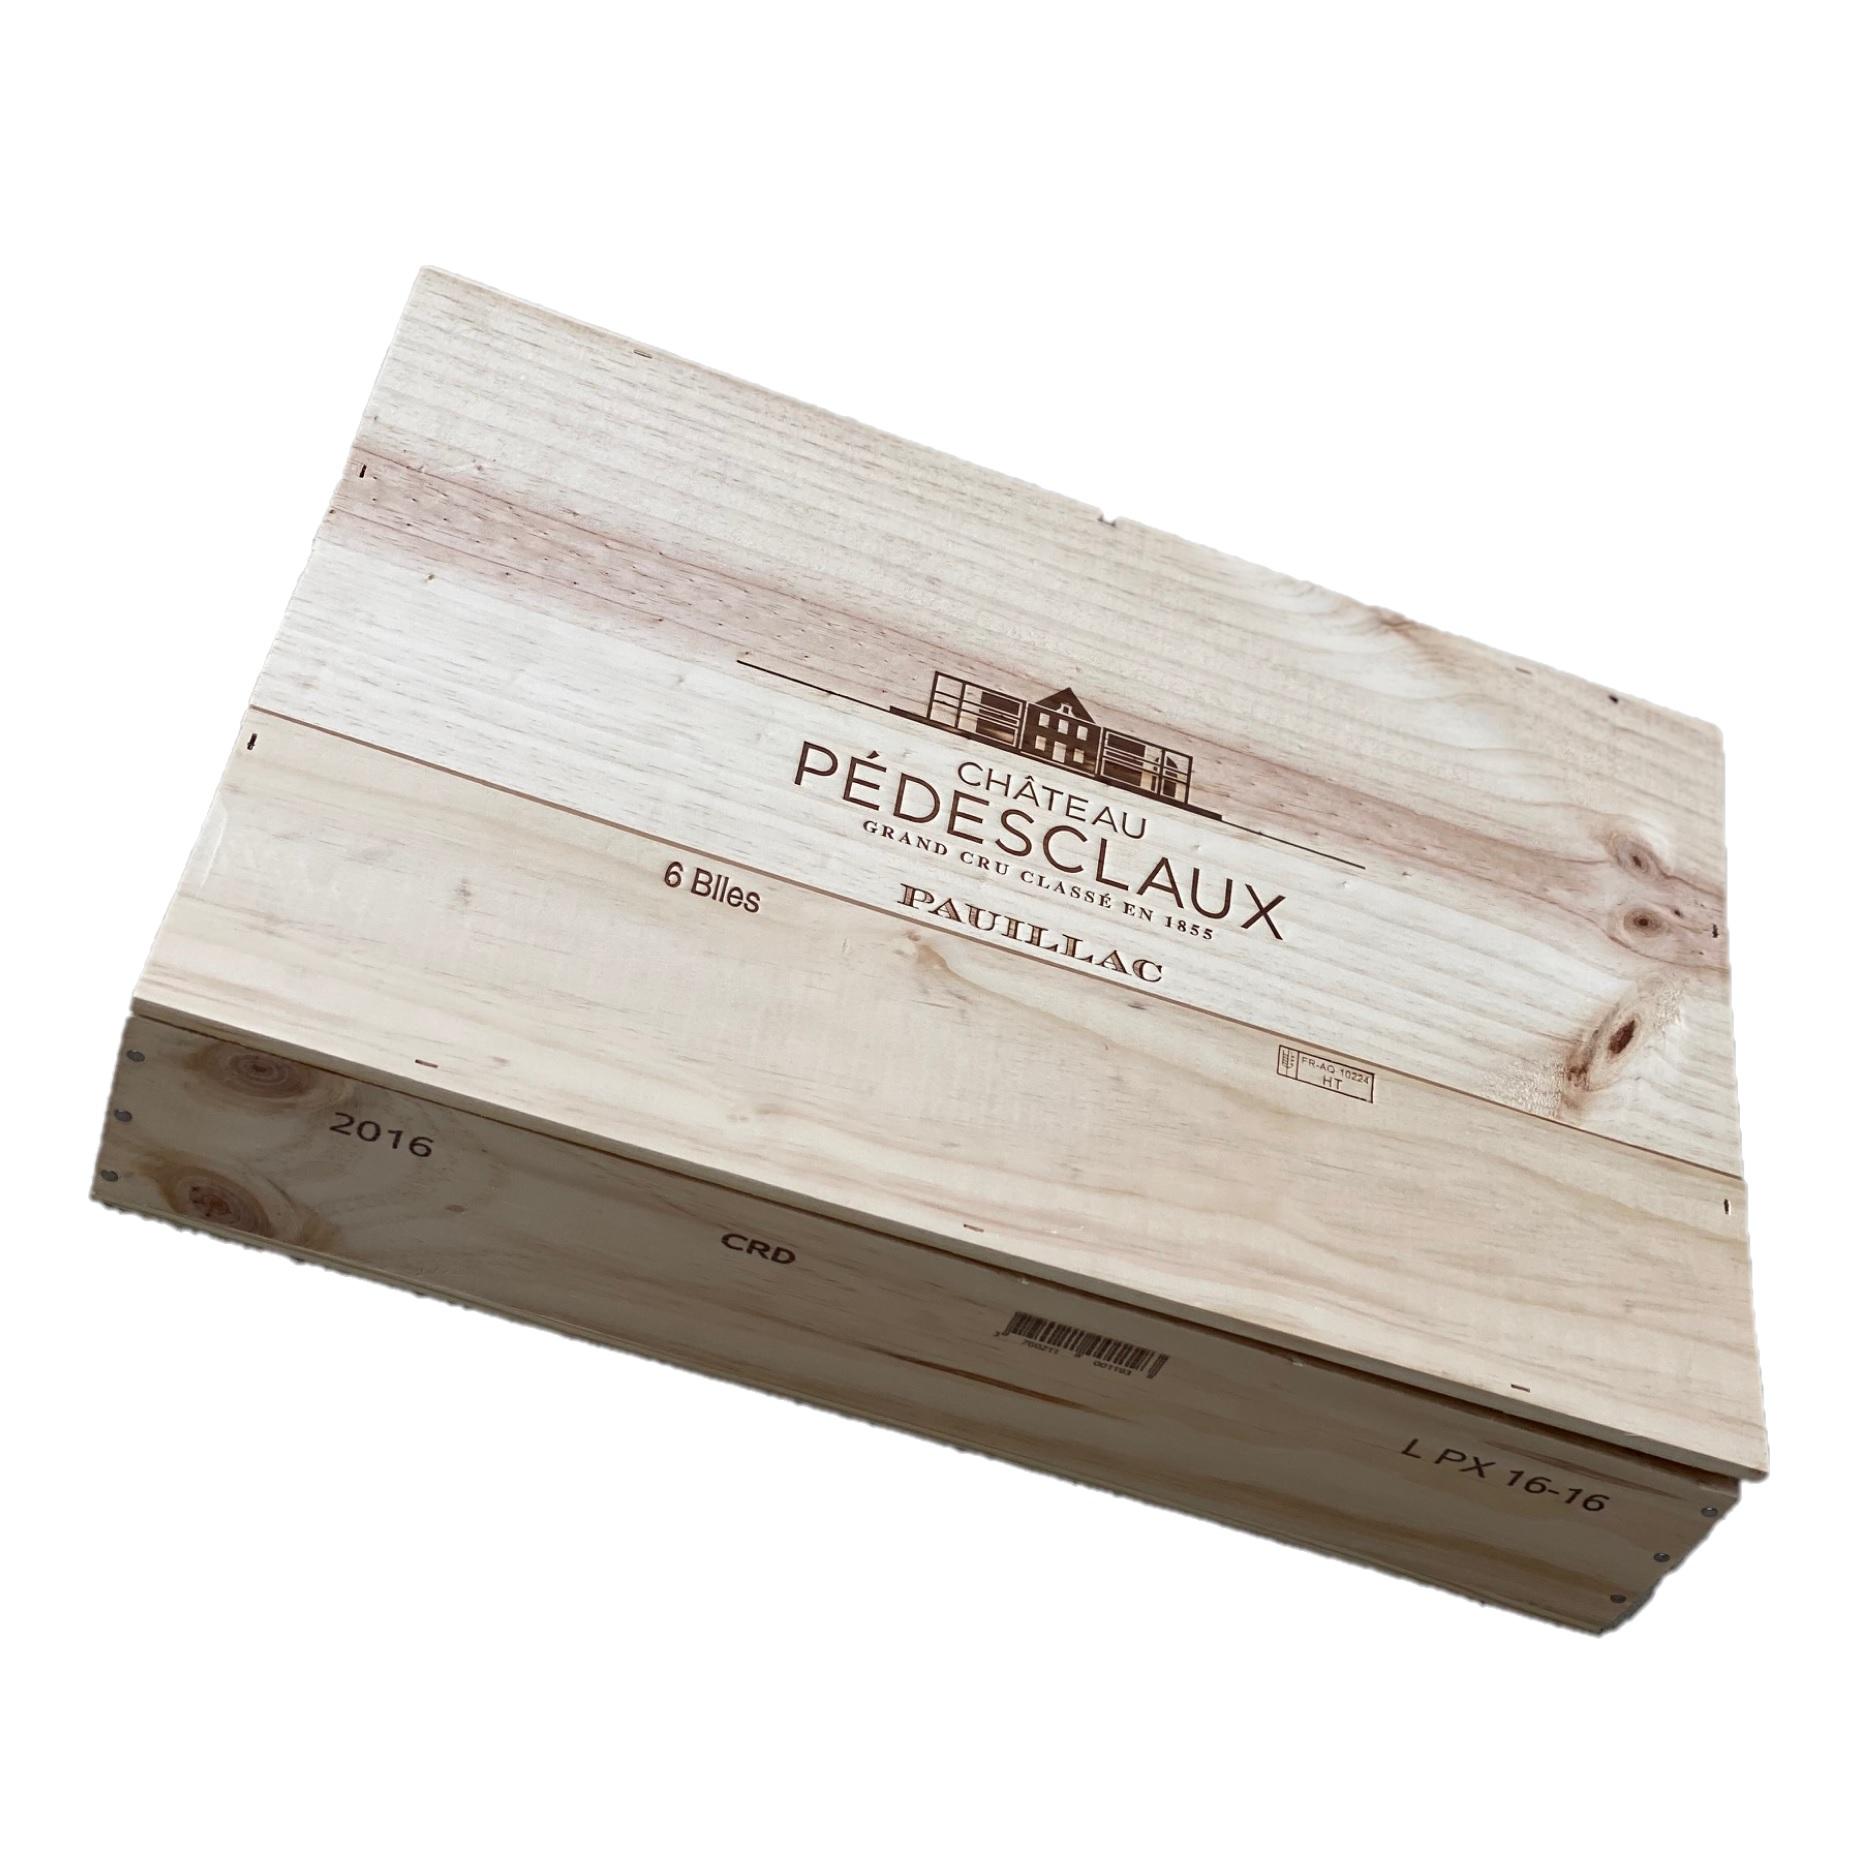 Puidust veinikast 6 pudelile Chateau Pedesclaux 5ème Grand Cru Classé Pauillac AOP 2016